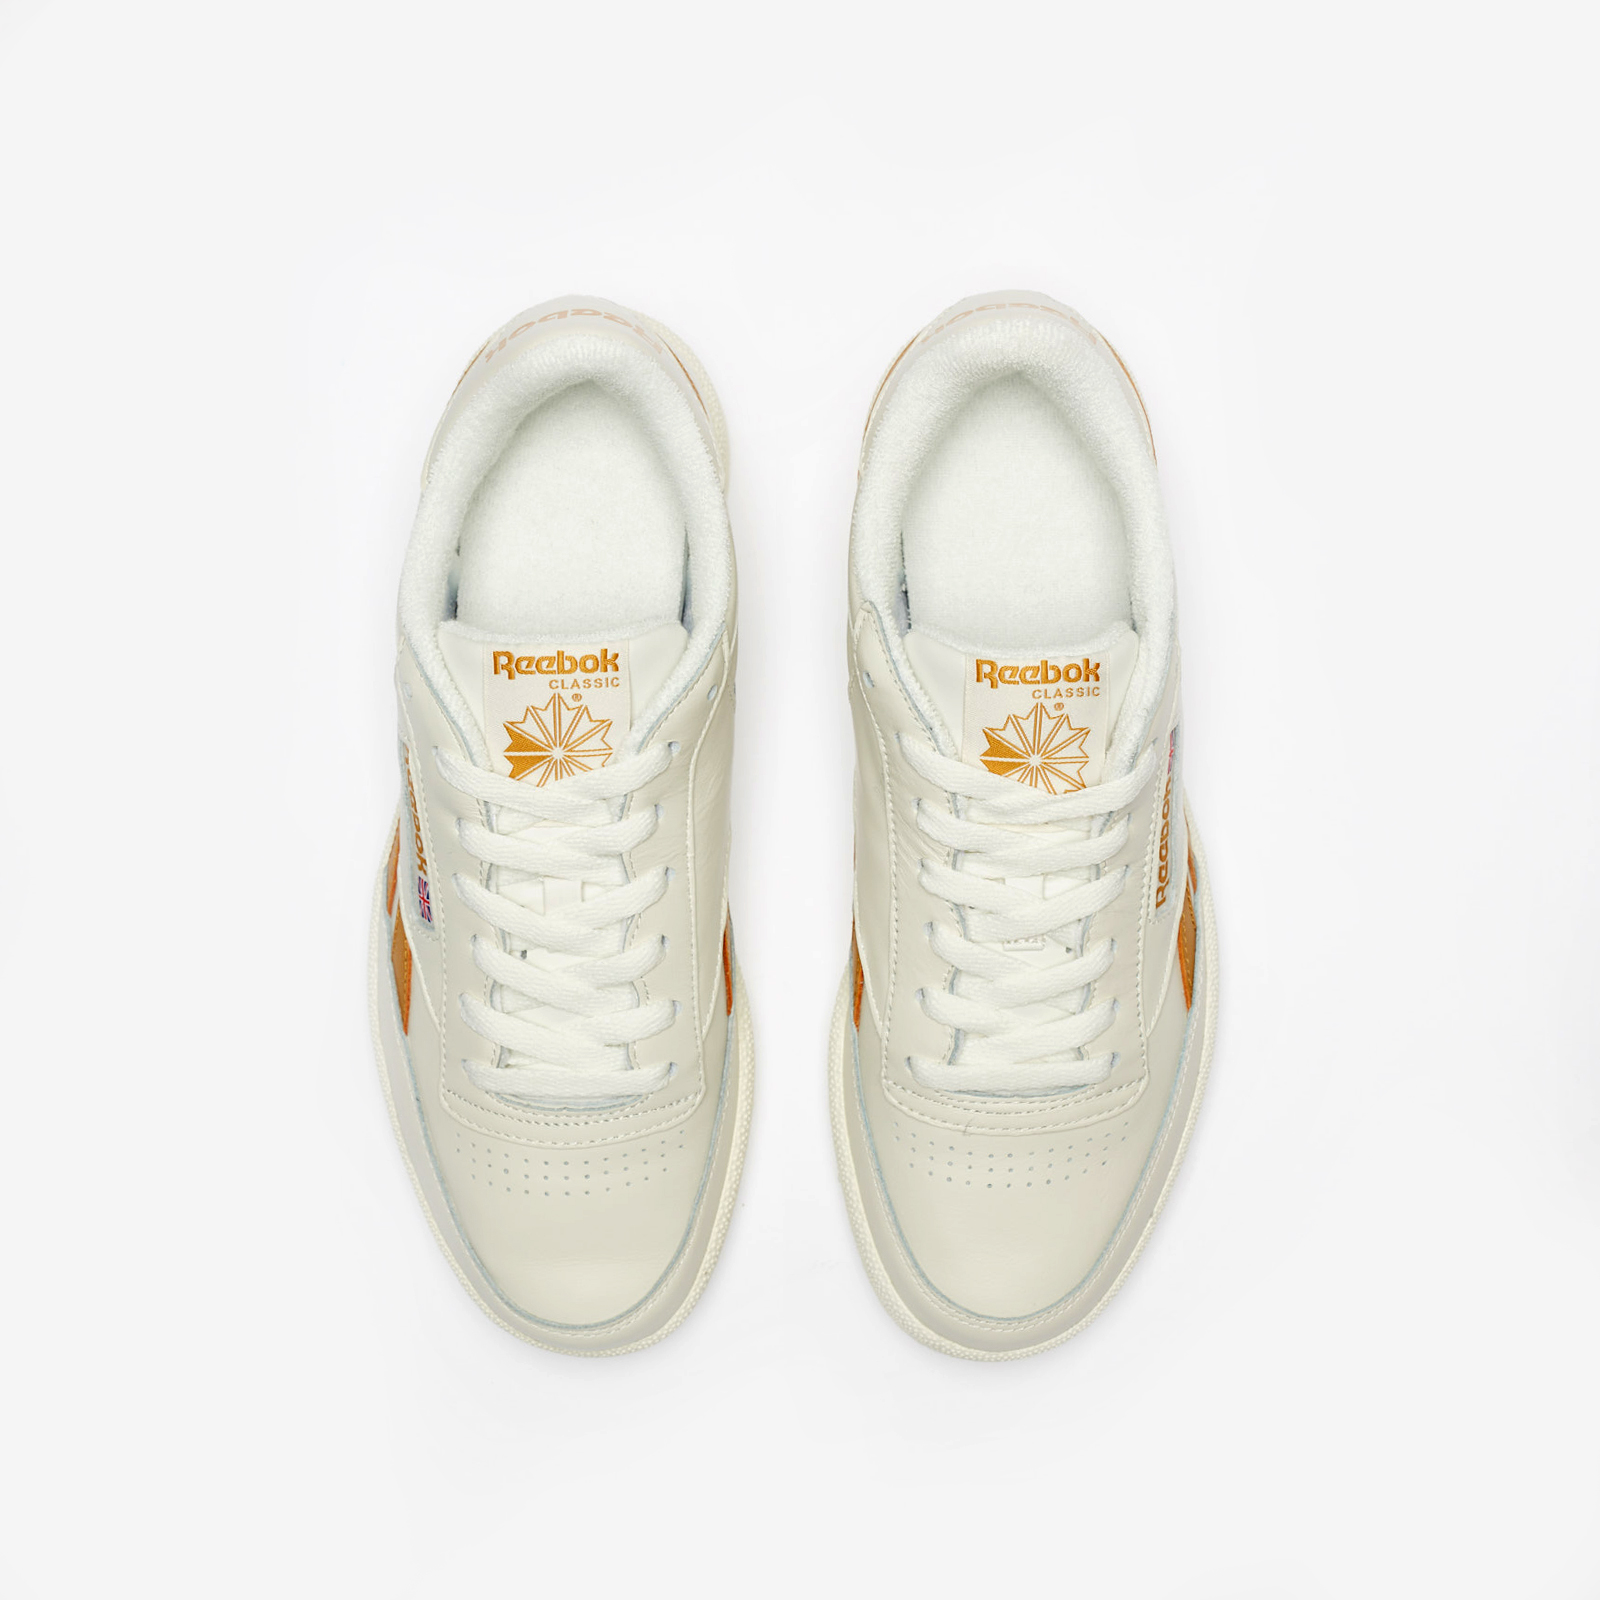 01f3bca74 Reebok Revenge Plus MU - Cn3927 - Sneakersnstuff | sneakers ...